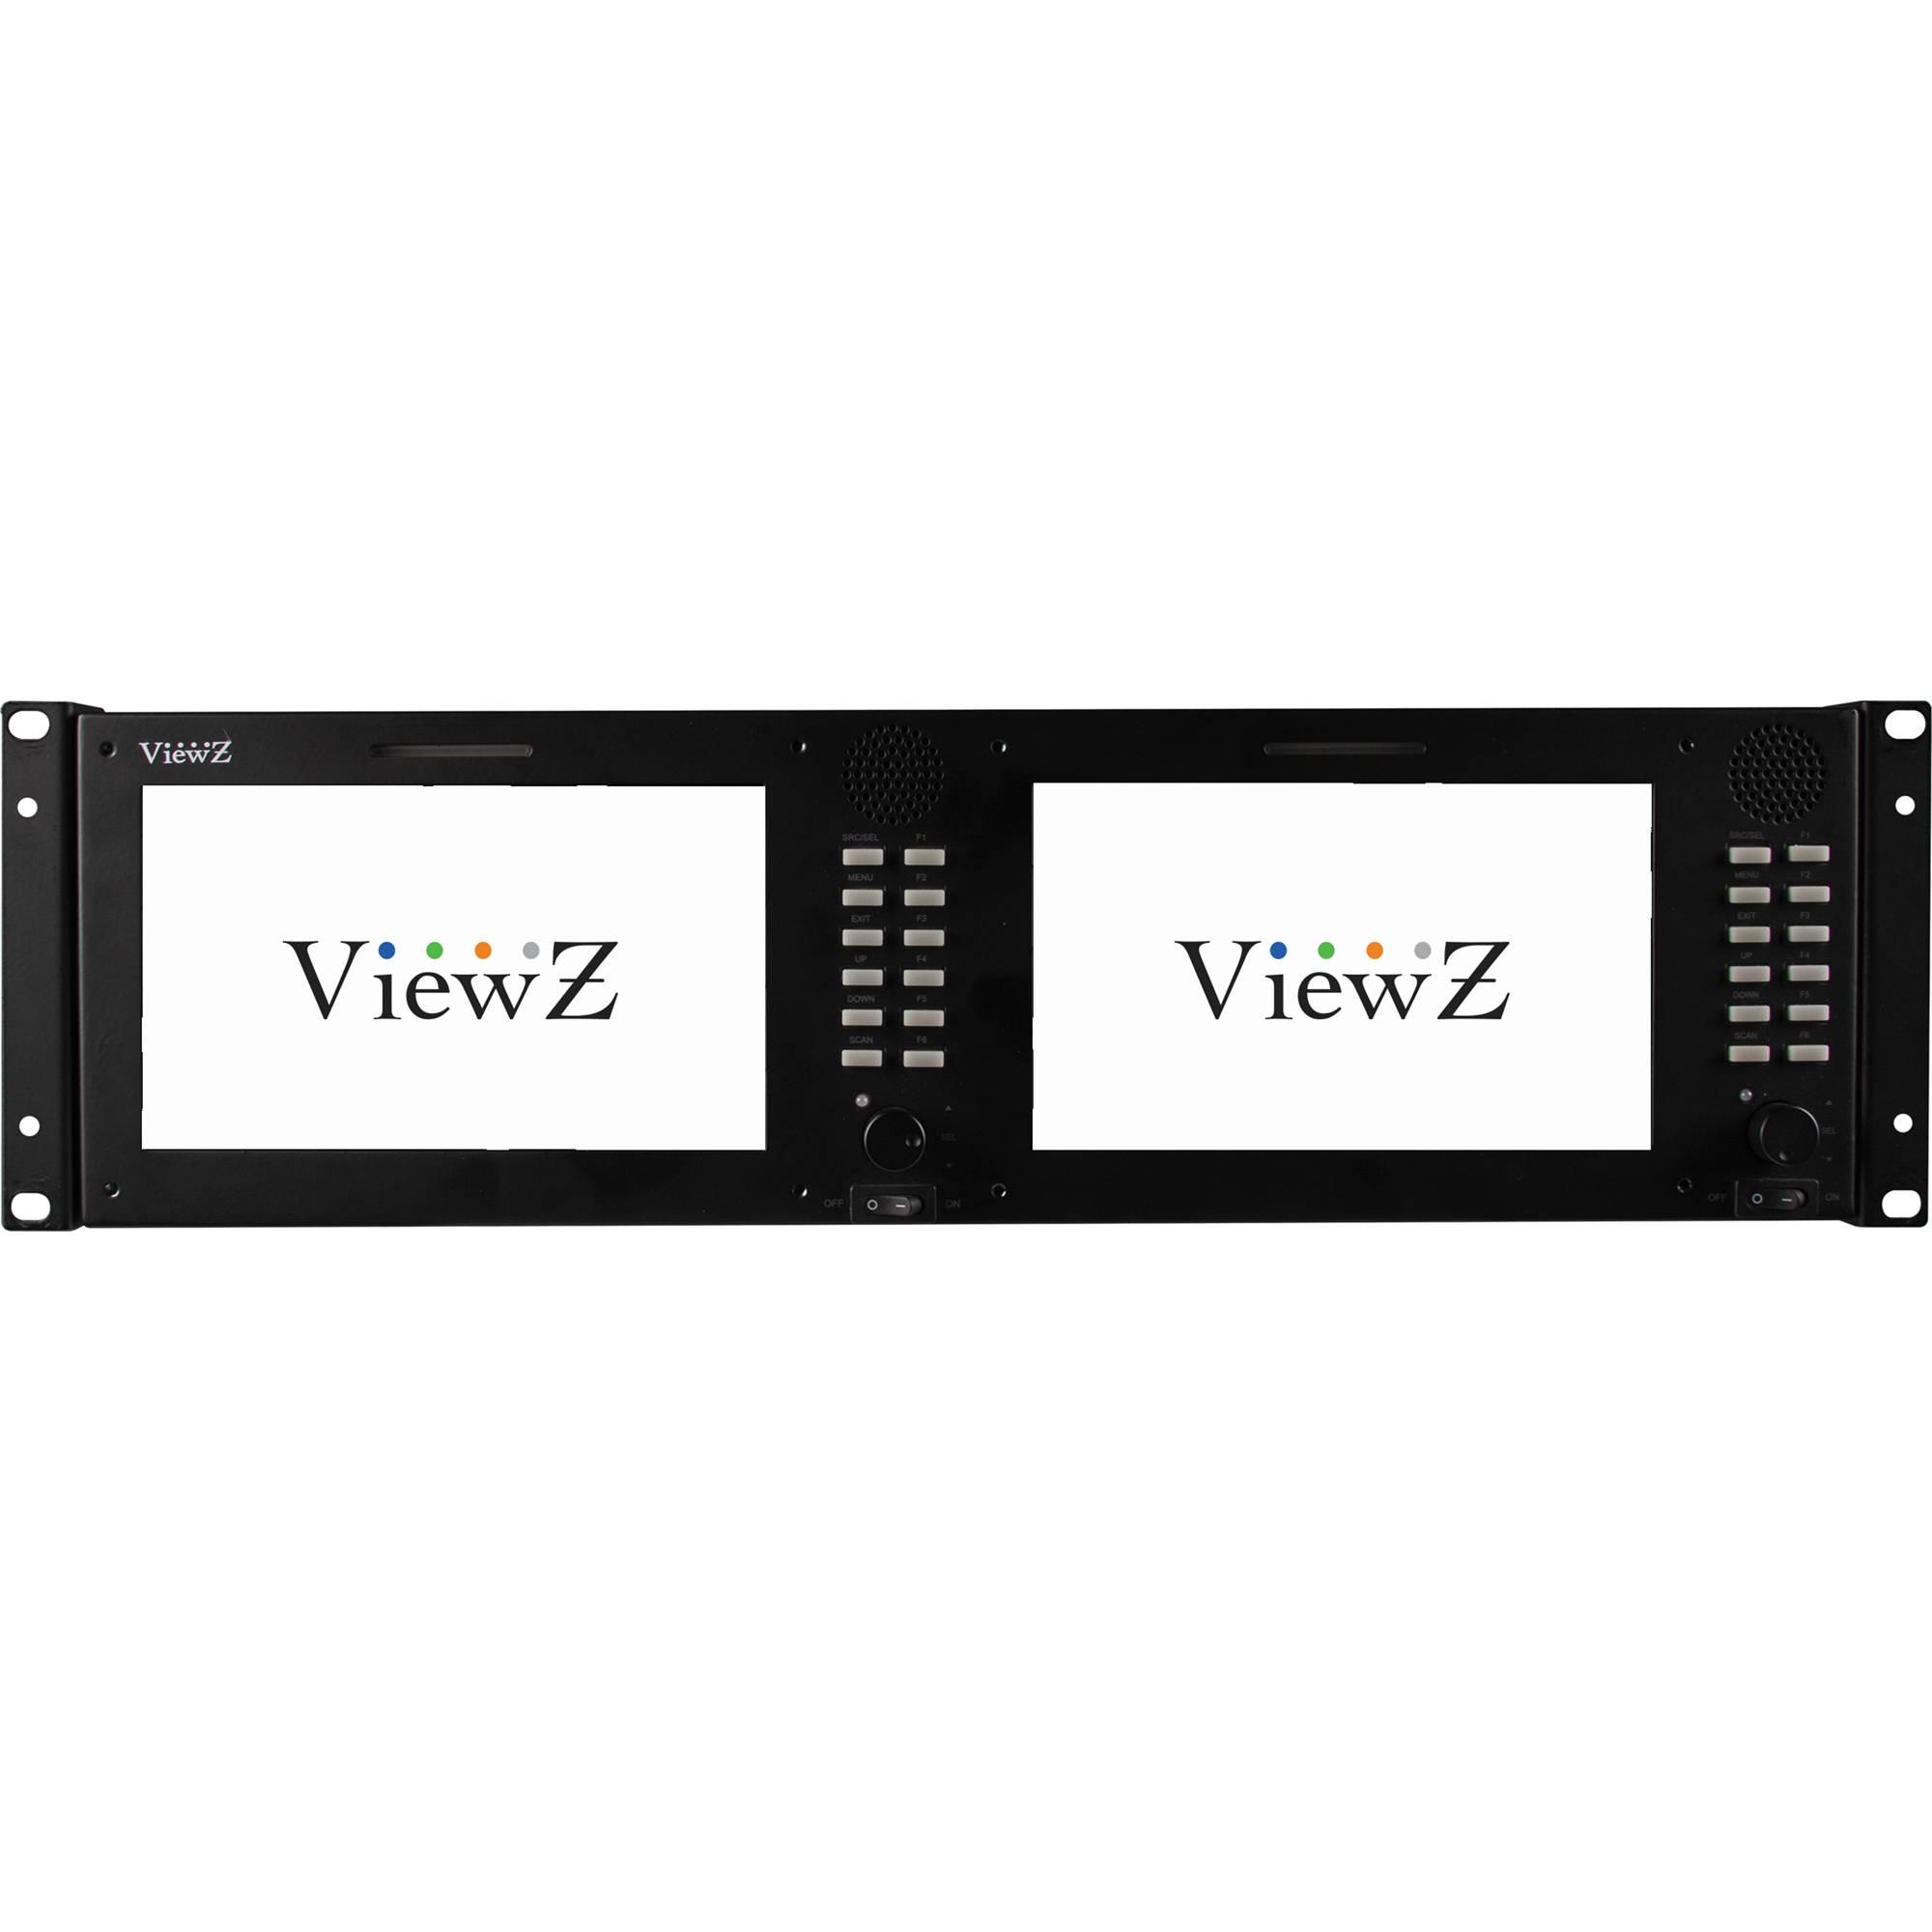 Viewz Vz 070rm 3g 3ru Dual 70 Sdi Bh Rbvhda8 Hd Sdsdi 1 Input 8 Output Video Distribution Amplifier Rackmount Monitor